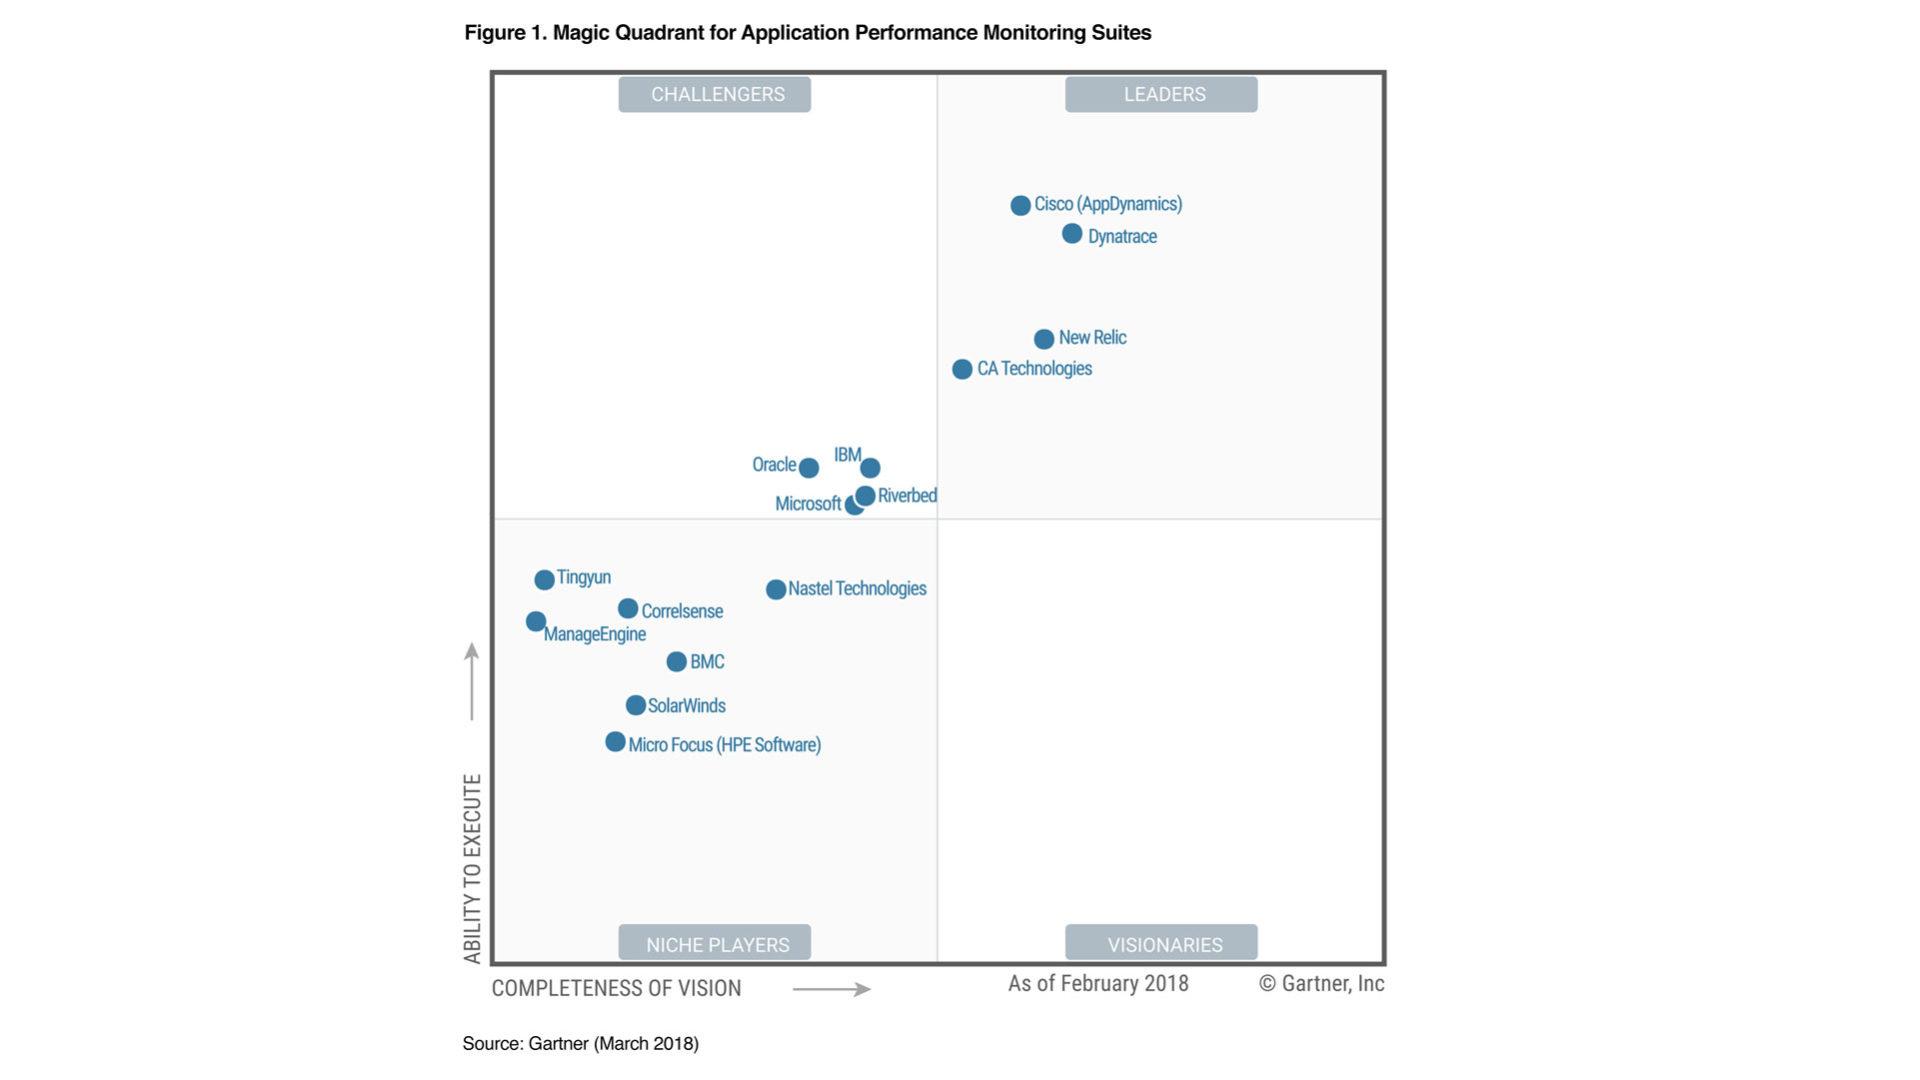 Grafico del Magic Quadrant for Applications Performance Monitoring